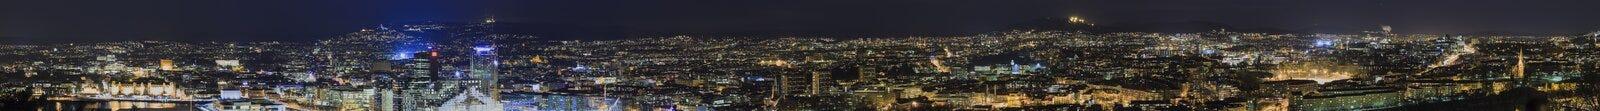 Panorama da noite de Oslo Imagens de Stock Royalty Free